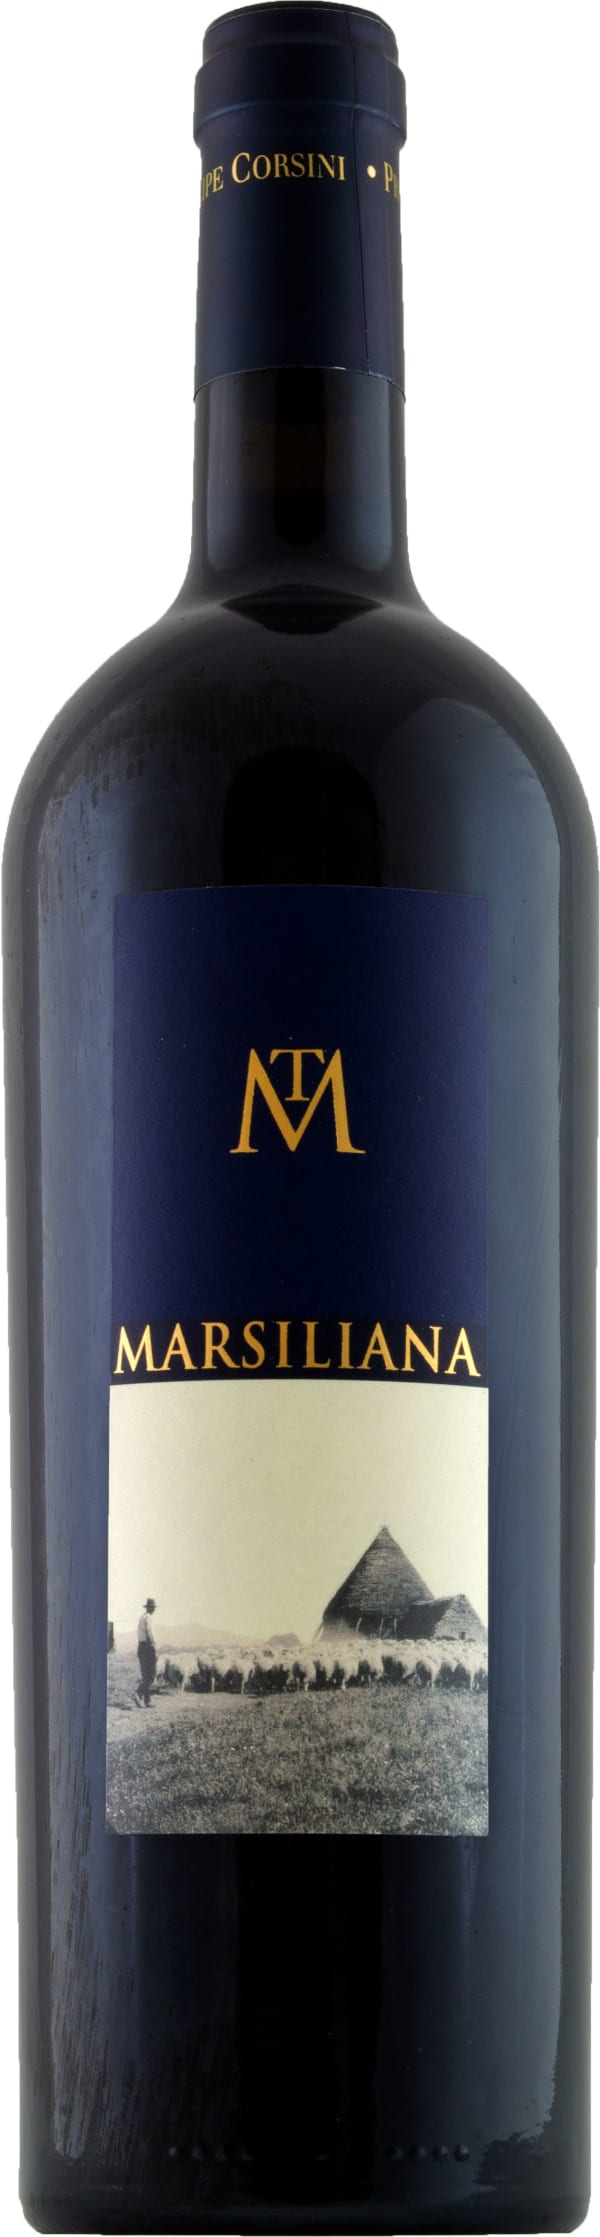 Tenuta Marsiliana Maremma Toscana Rosso 2011